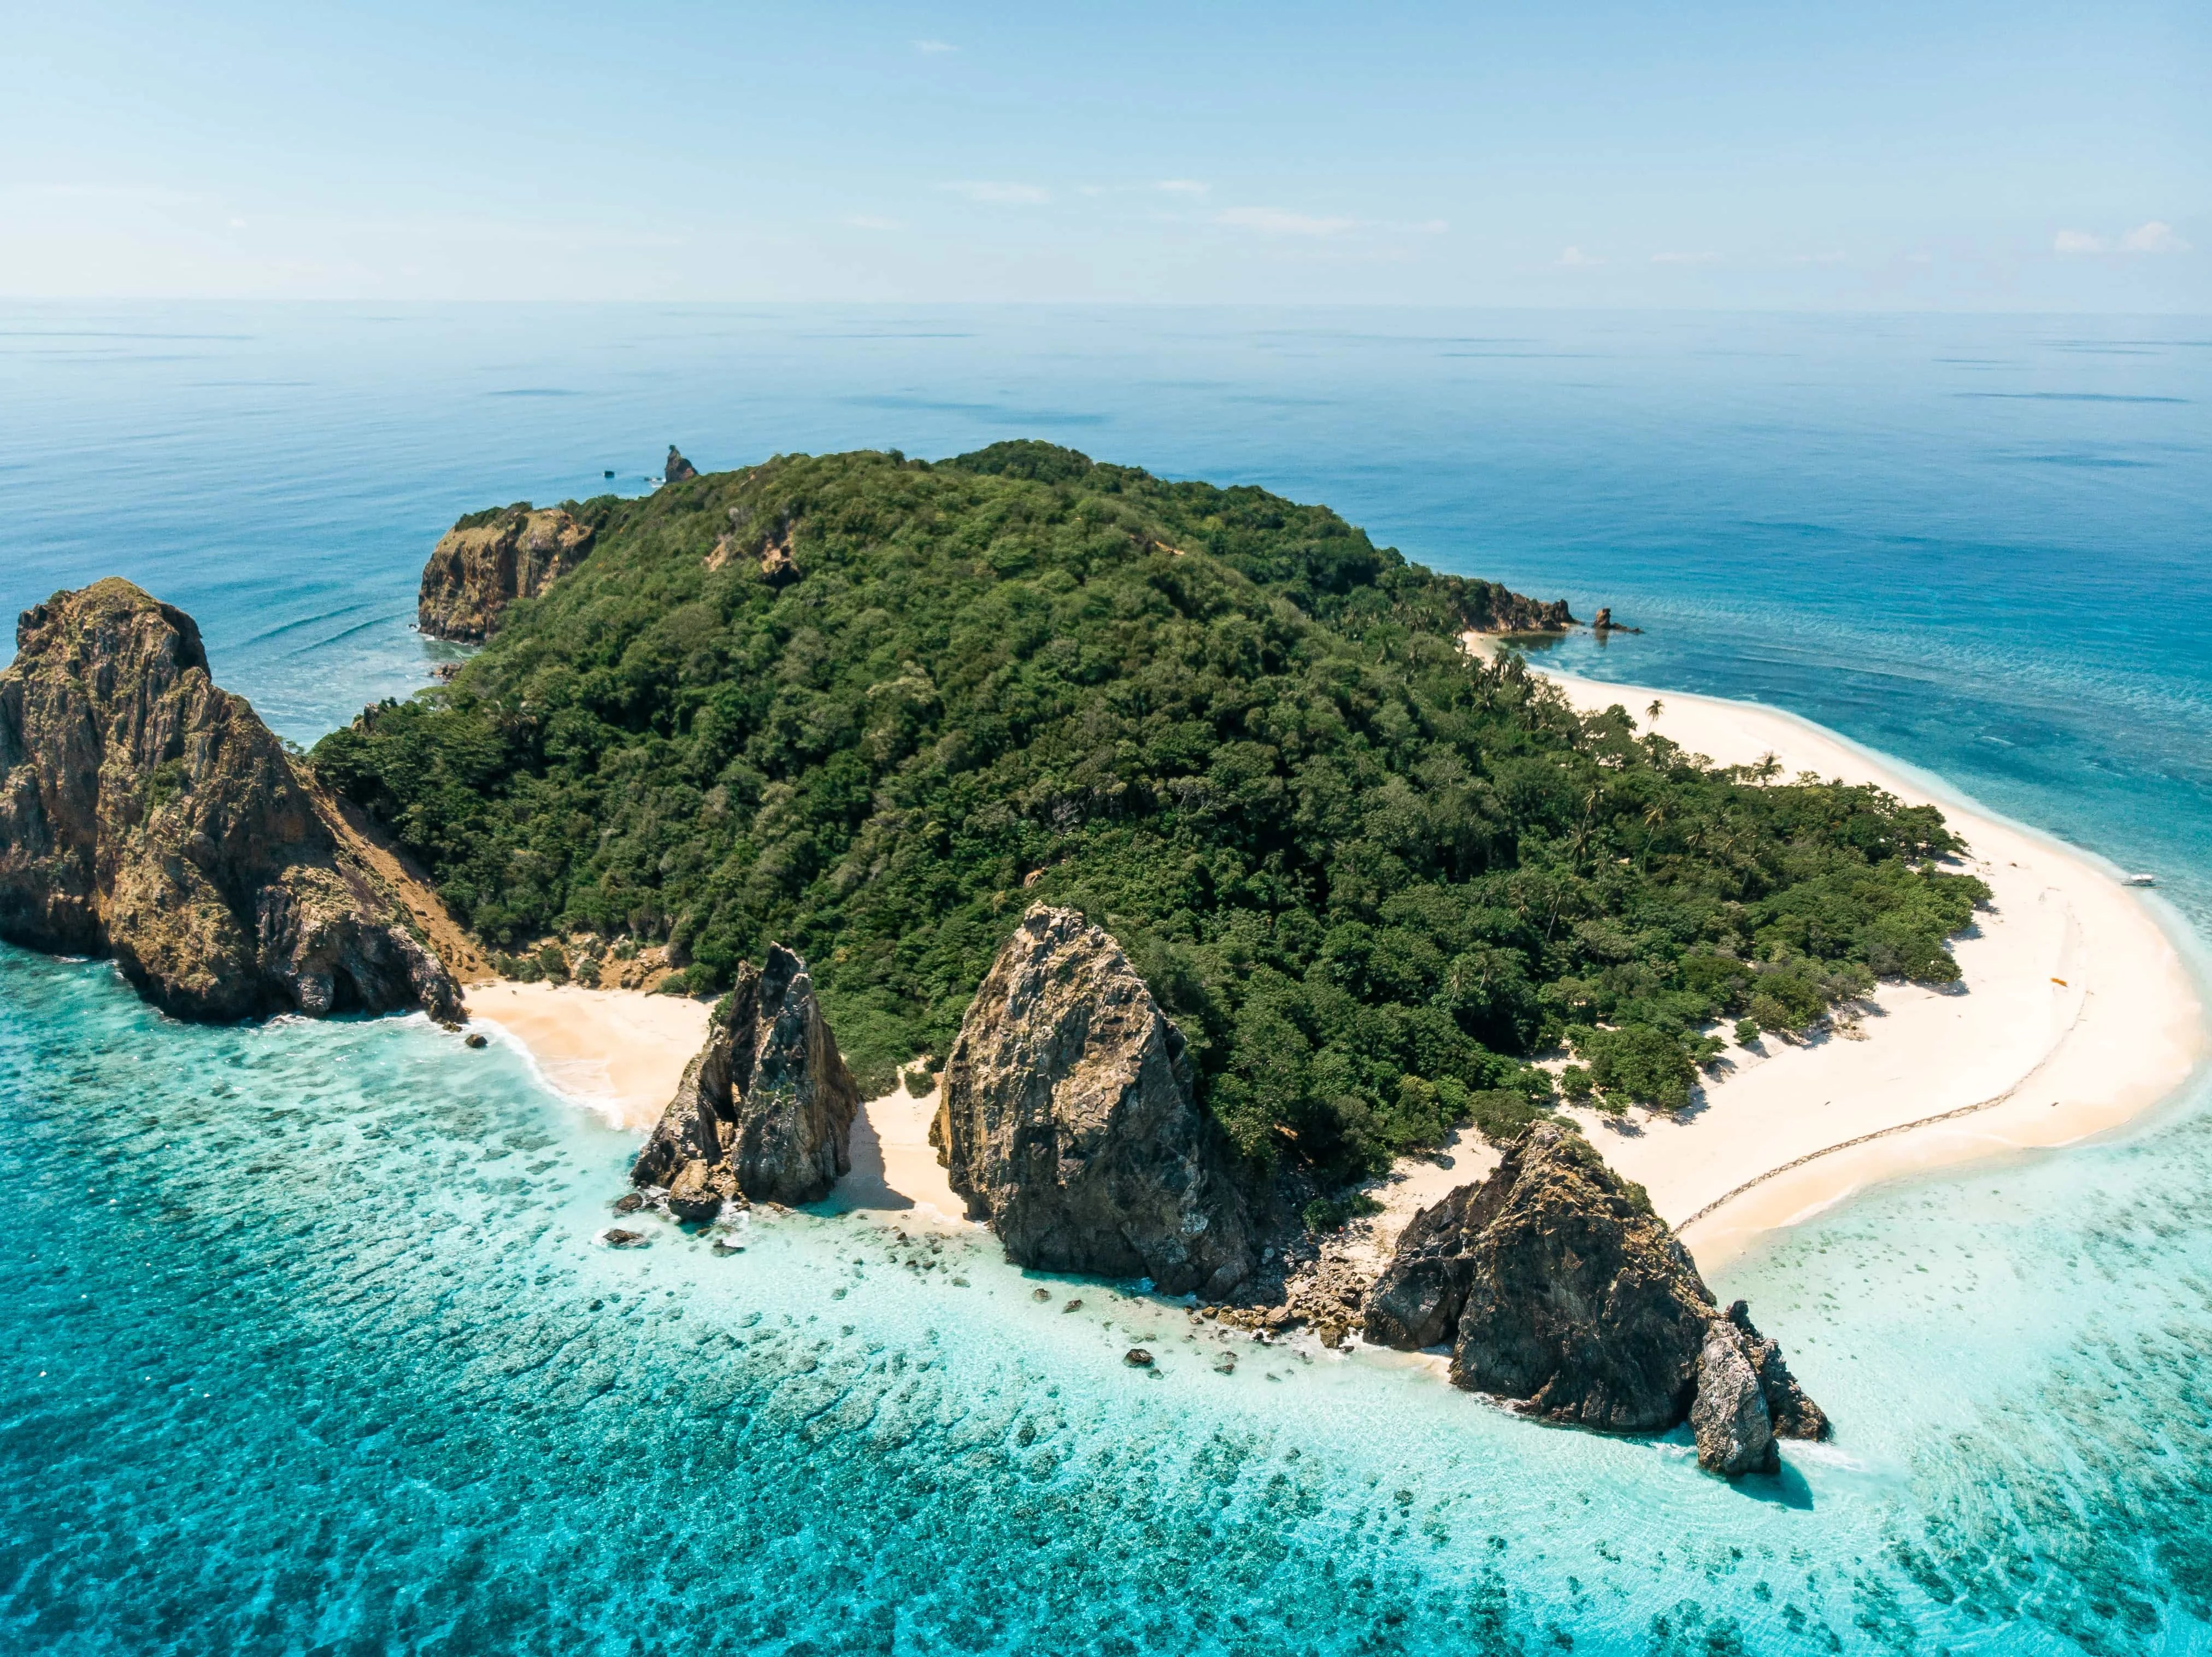 Dumunpalit Island, Coron tourist spots, Coron travel guide